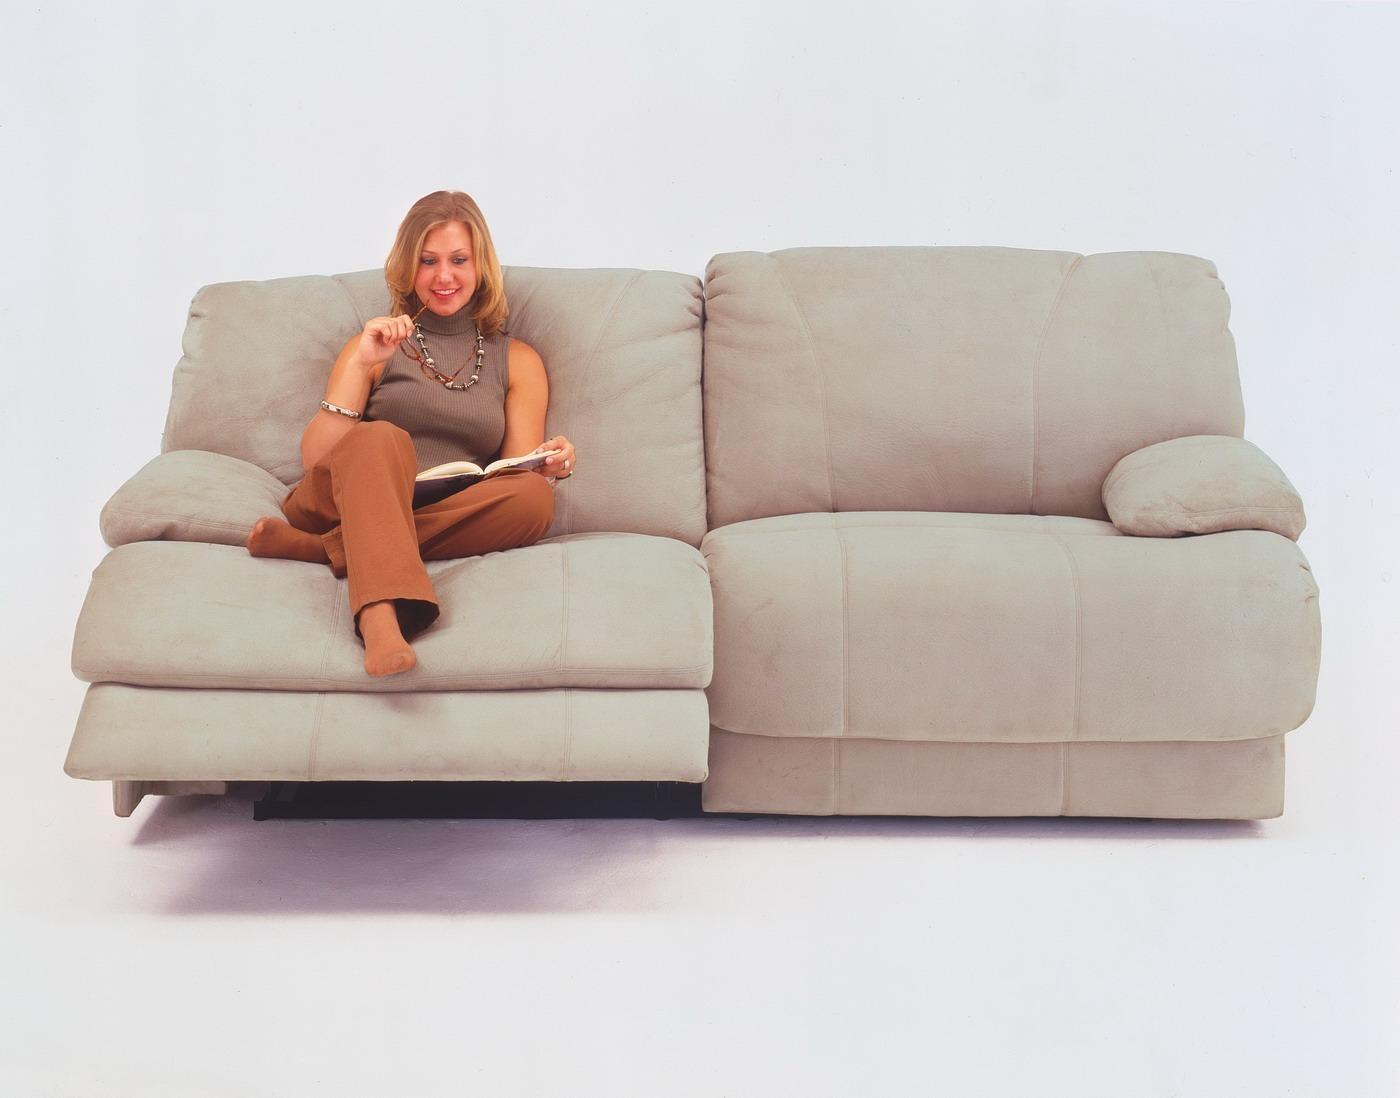 berkline recliner sofa wooden bed designs pictures 20 best collection of reclining sofas ideas